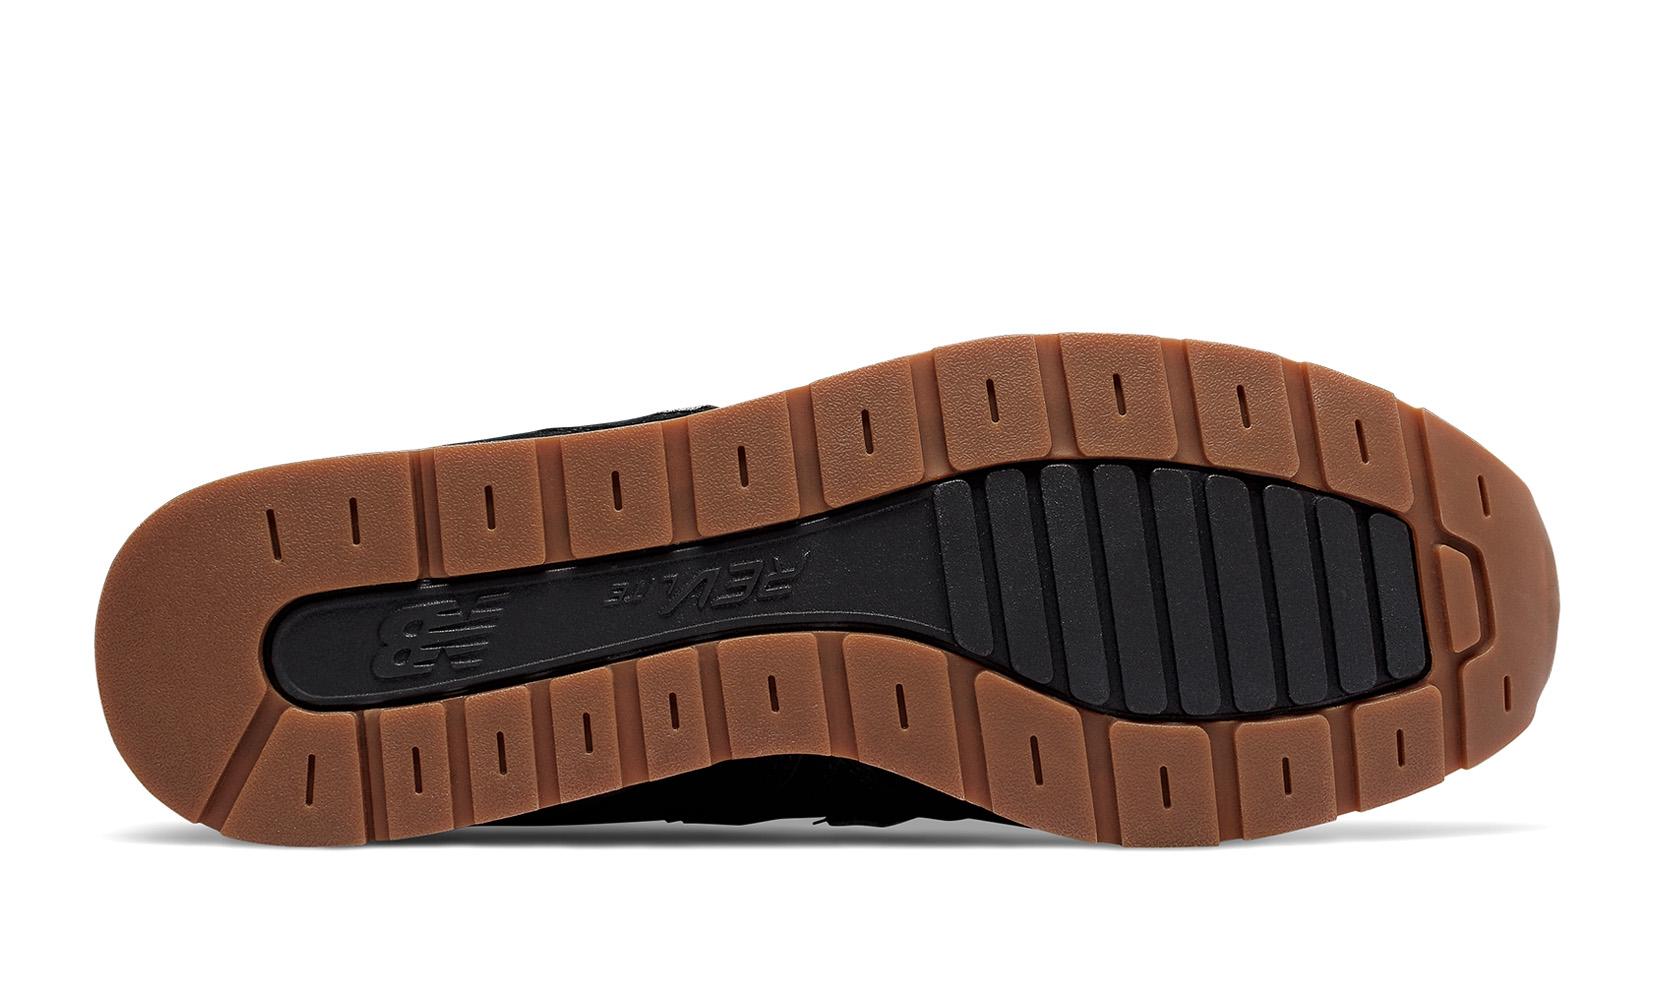 new style a3aca 29622 Чоловіче взуття повсякденне New Balance 996 MRL996PA | New ...